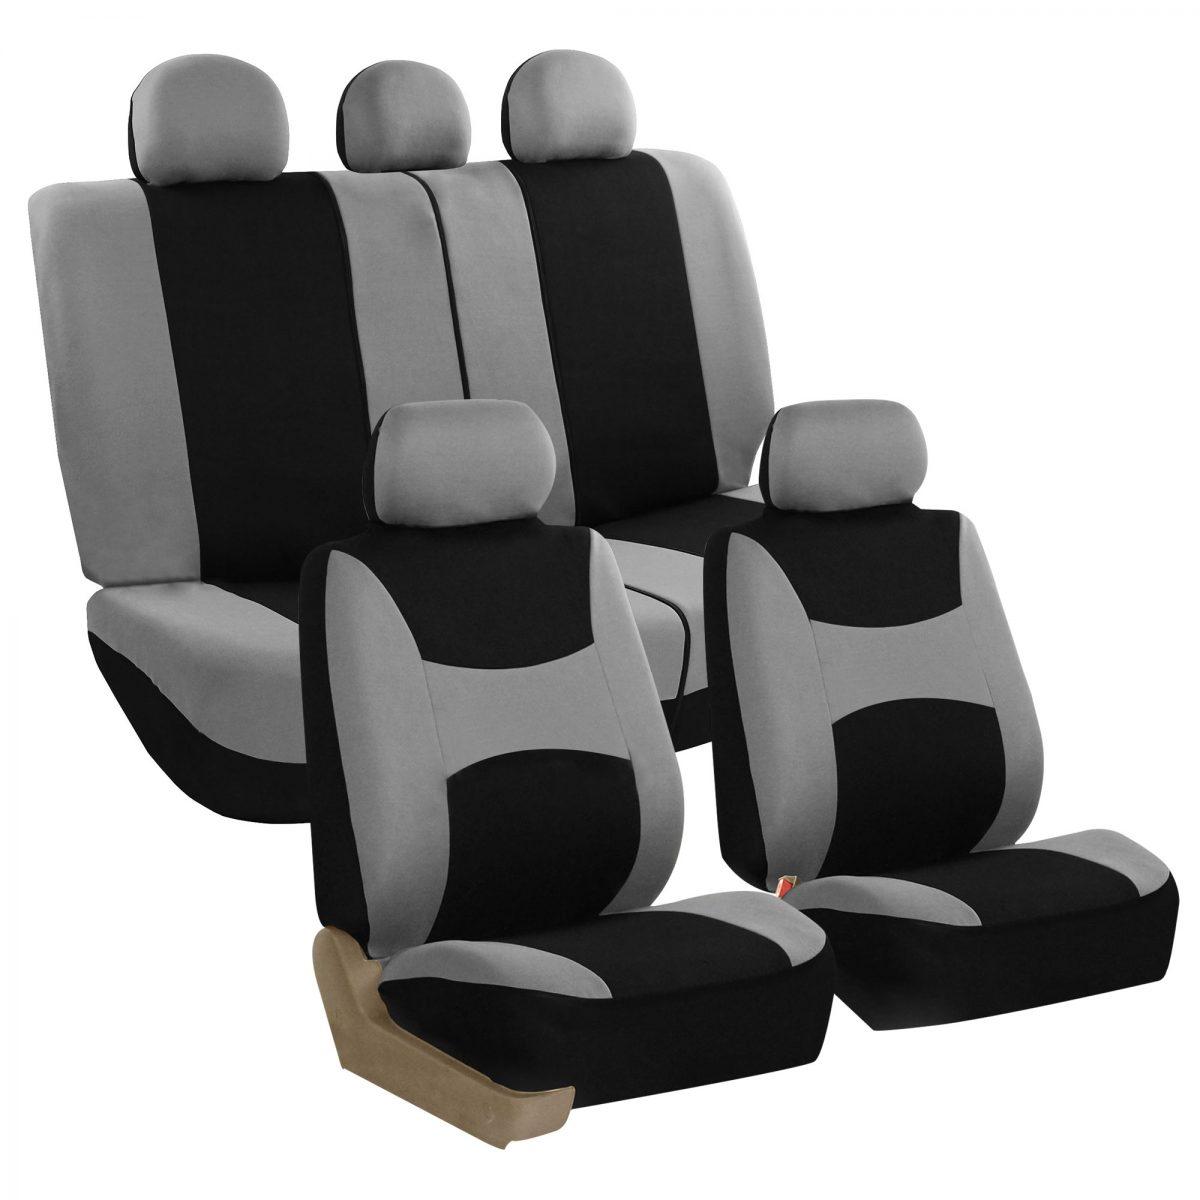 Light & Breezy Flat Cloth Seat Covers - Full Set